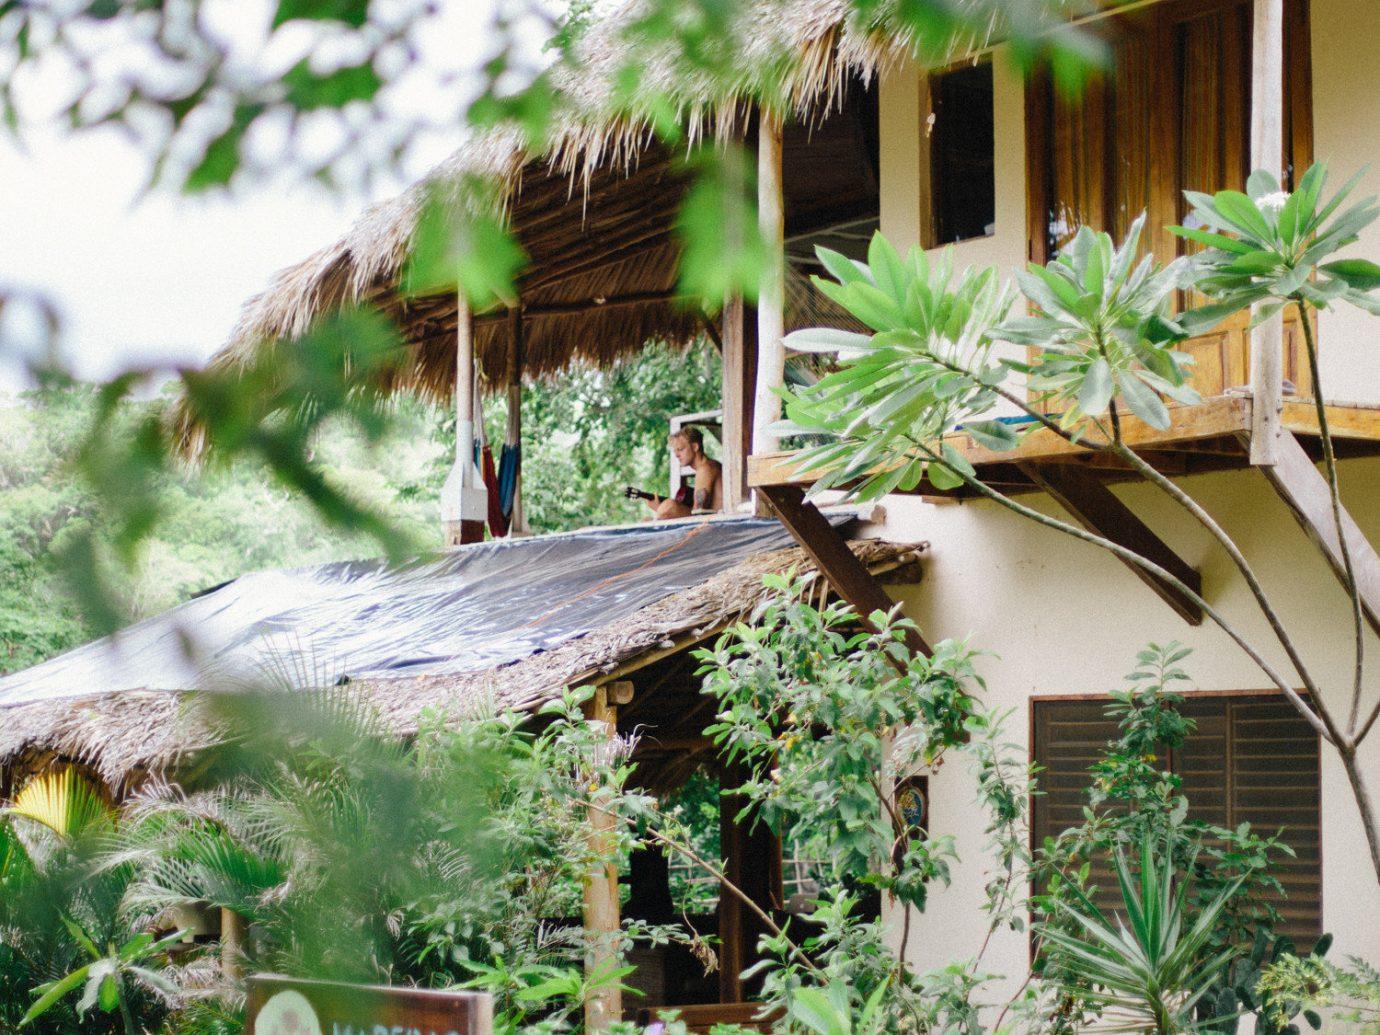 Hotels Solo Travel outdoor tree flora plant botany Garden backyard flower yard Jungle Resort bushes surrounded